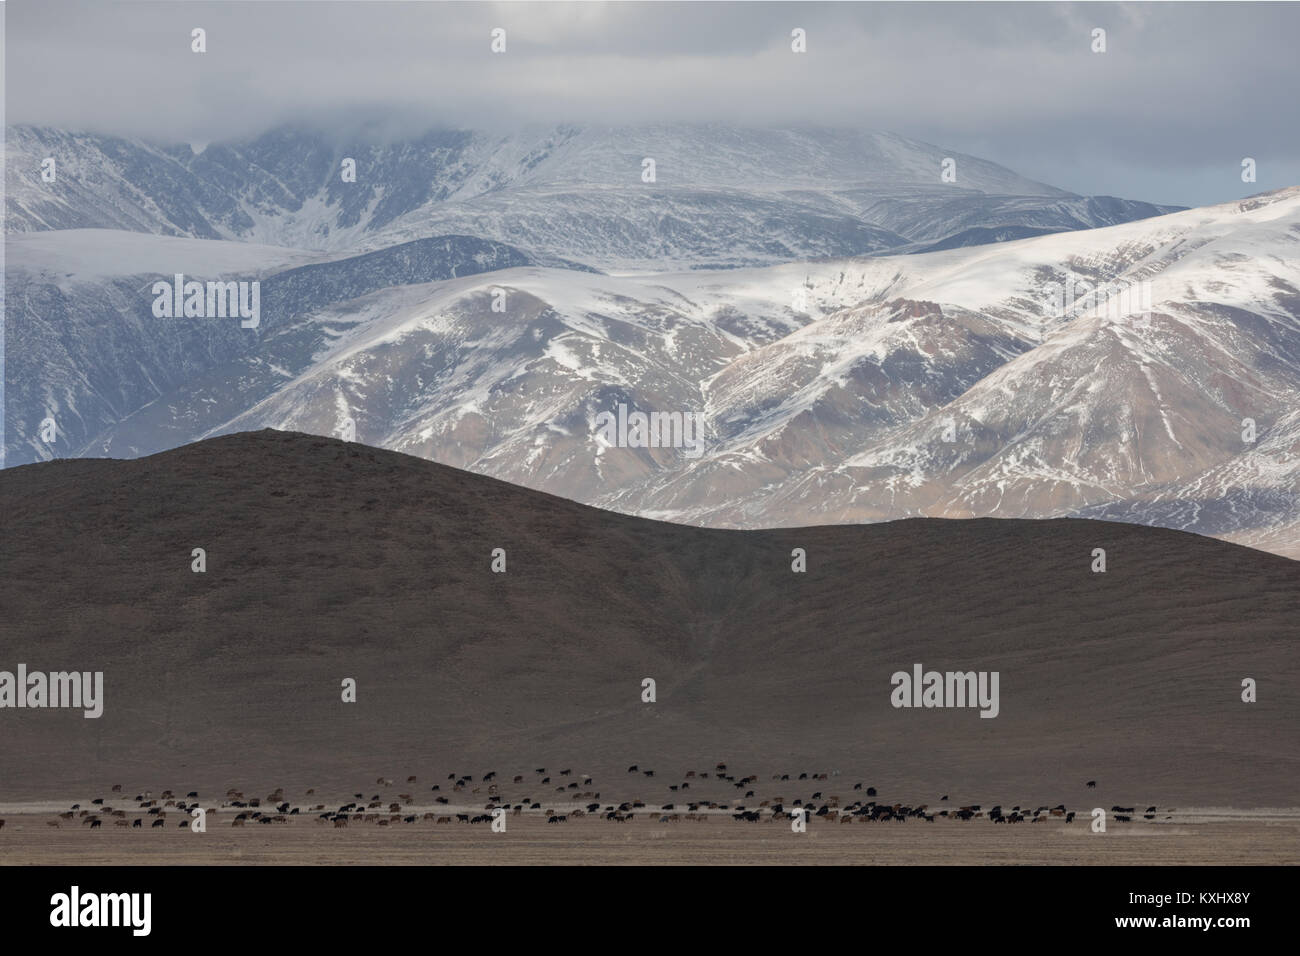 Mongolian landscape snowy mountains snow winter cloudy goat herd Mongolia - Stock Image